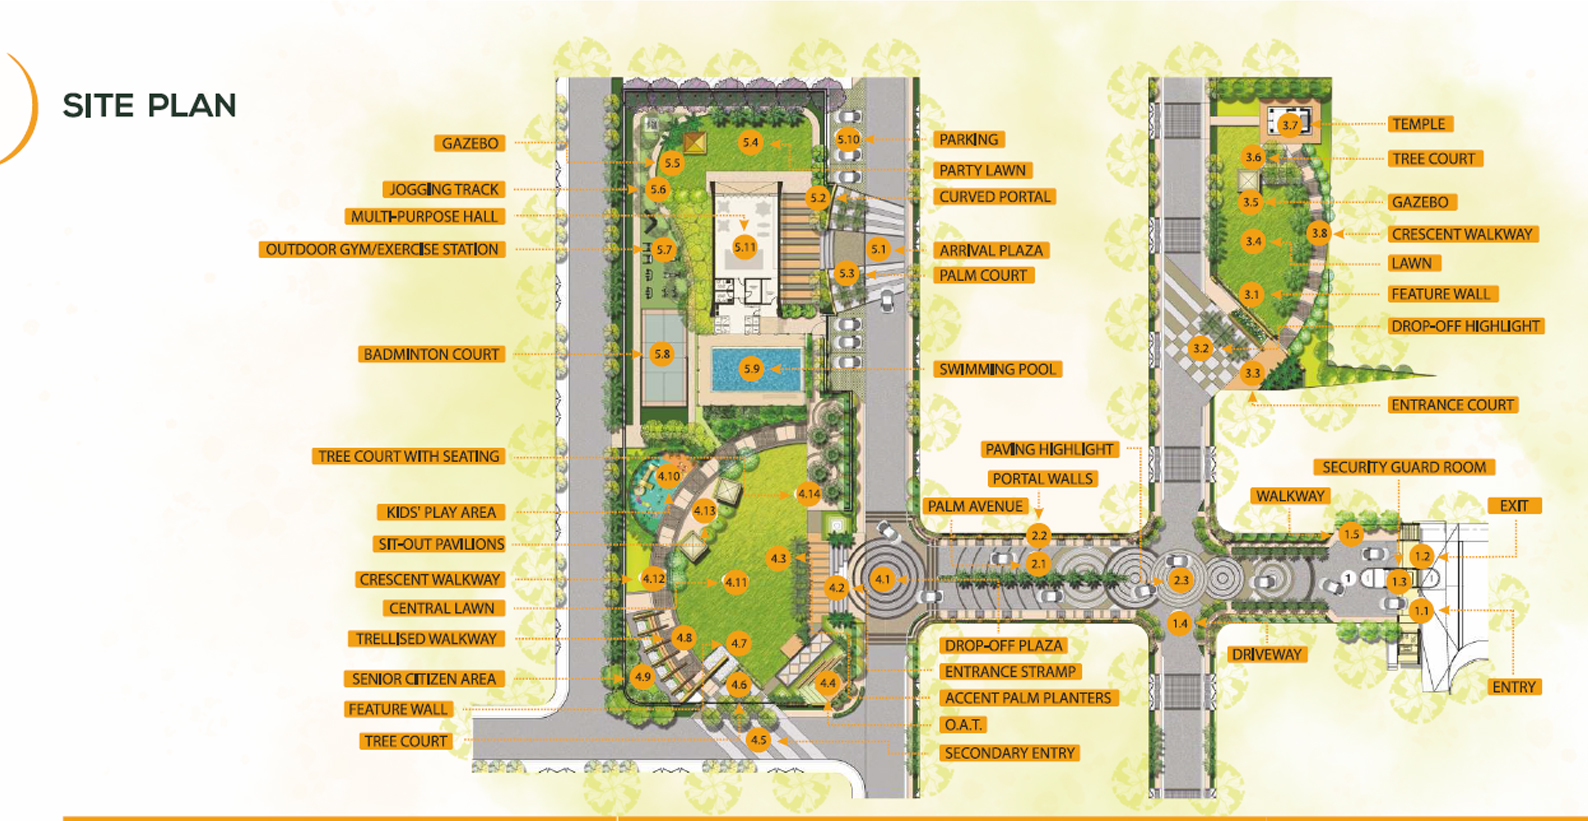 radhu oakwood site plan